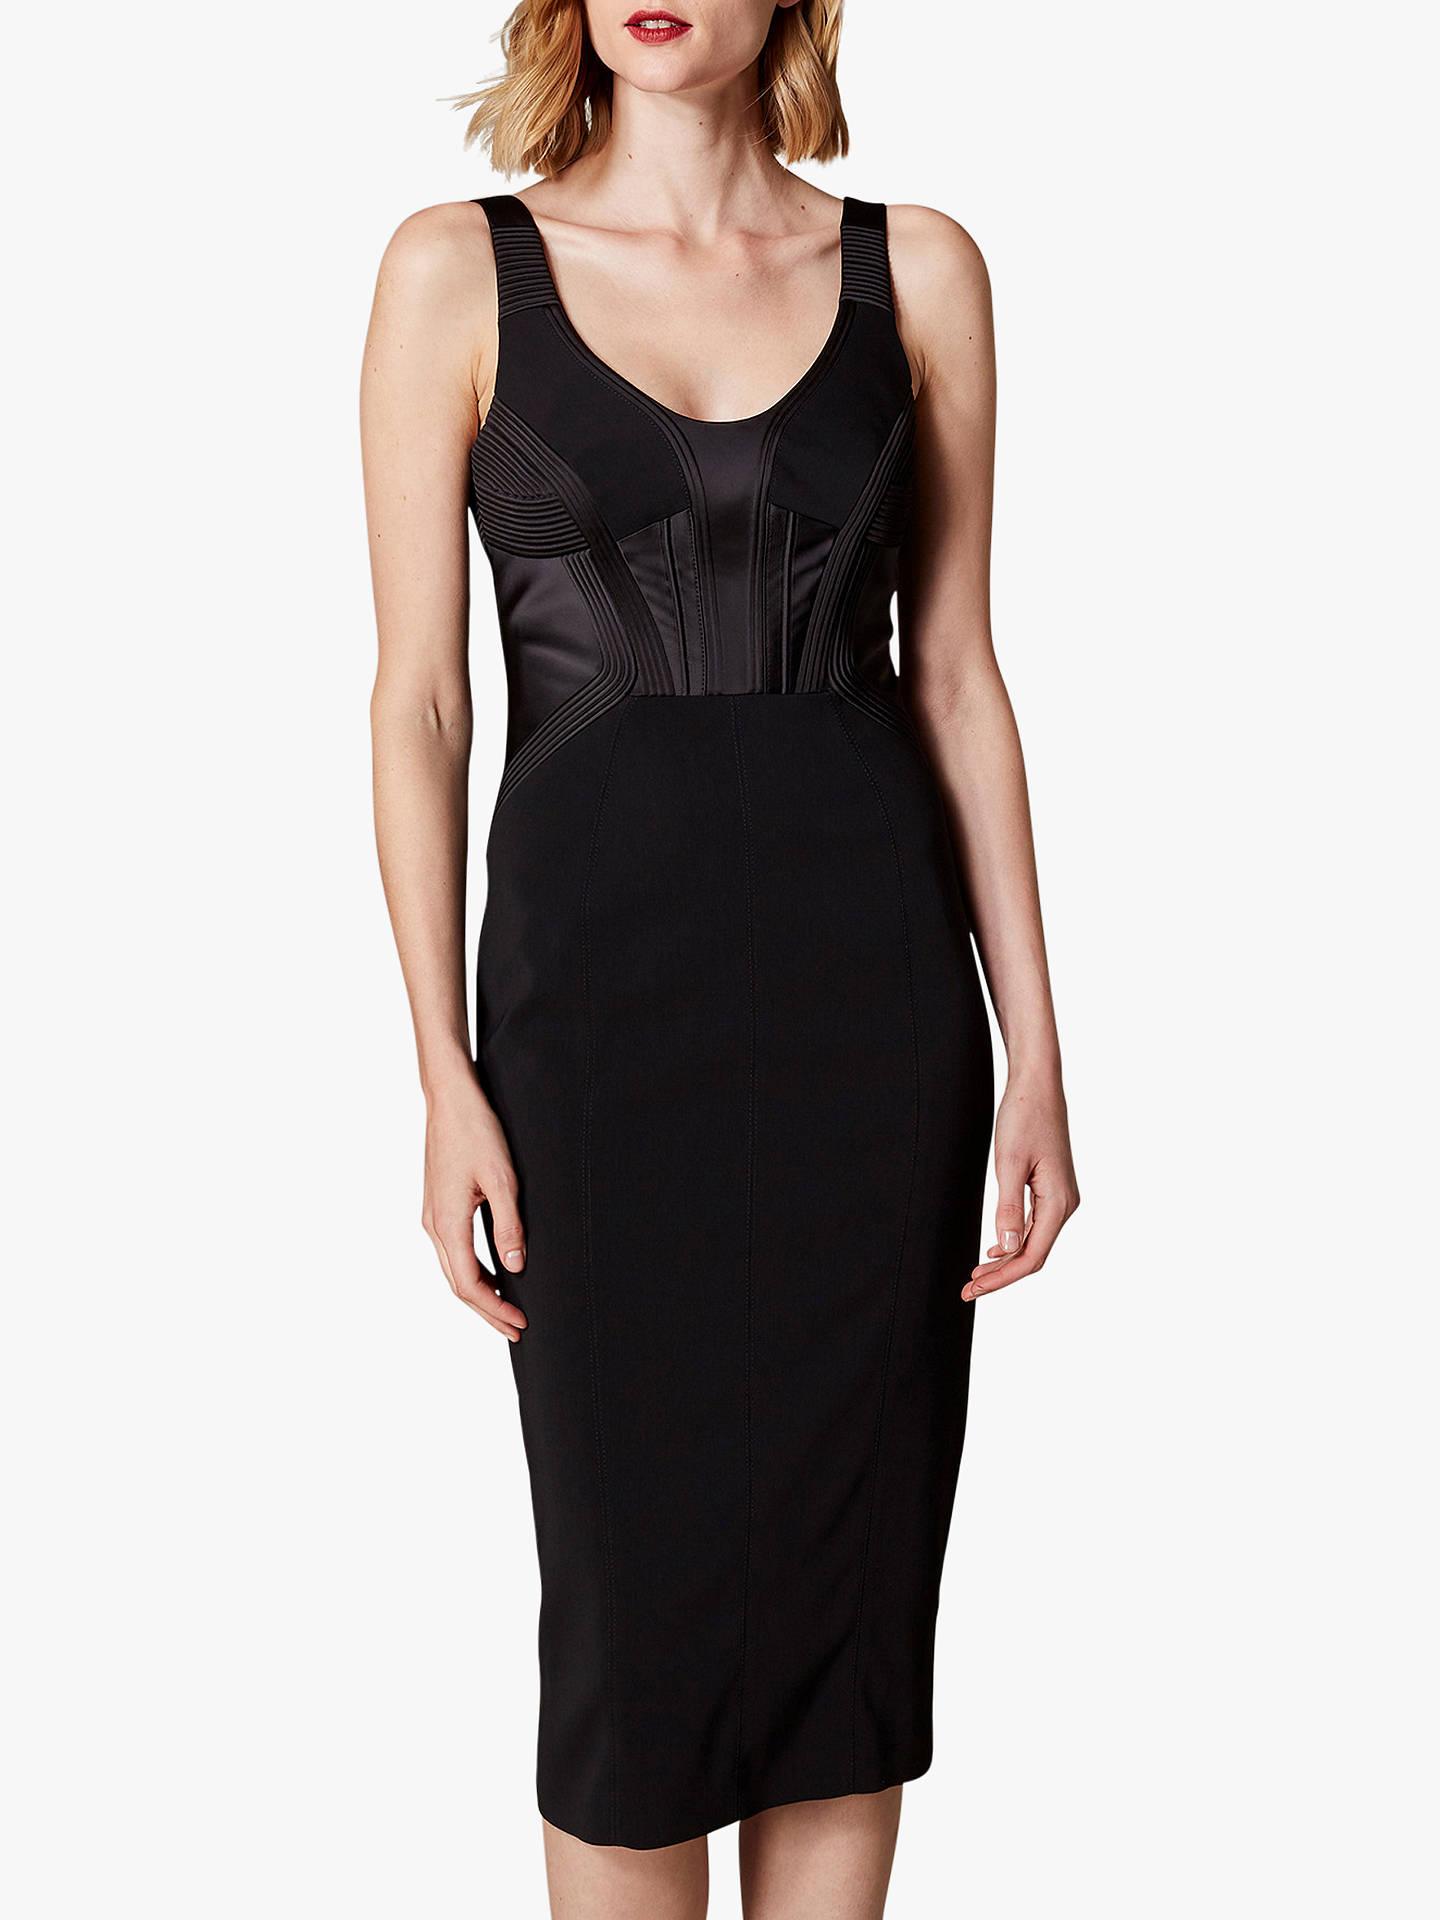 e110034688594 Karen Millen Corset Bodice Midi Dress, Black at John Lewis & Partners